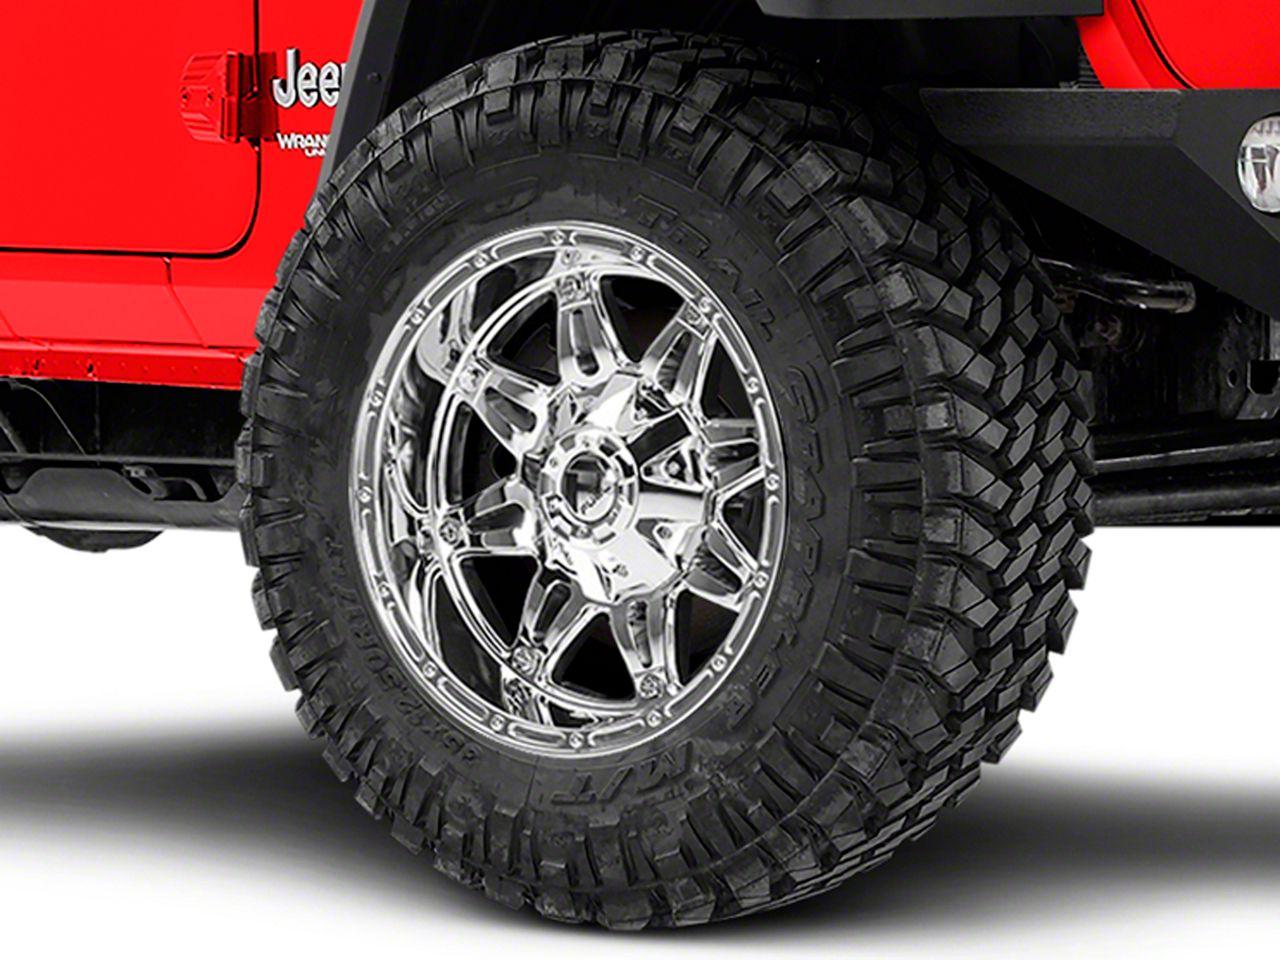 Wheels Chrome 20x10 Fuel Offroad Wheels Hostage 8x170-24 Offset ...